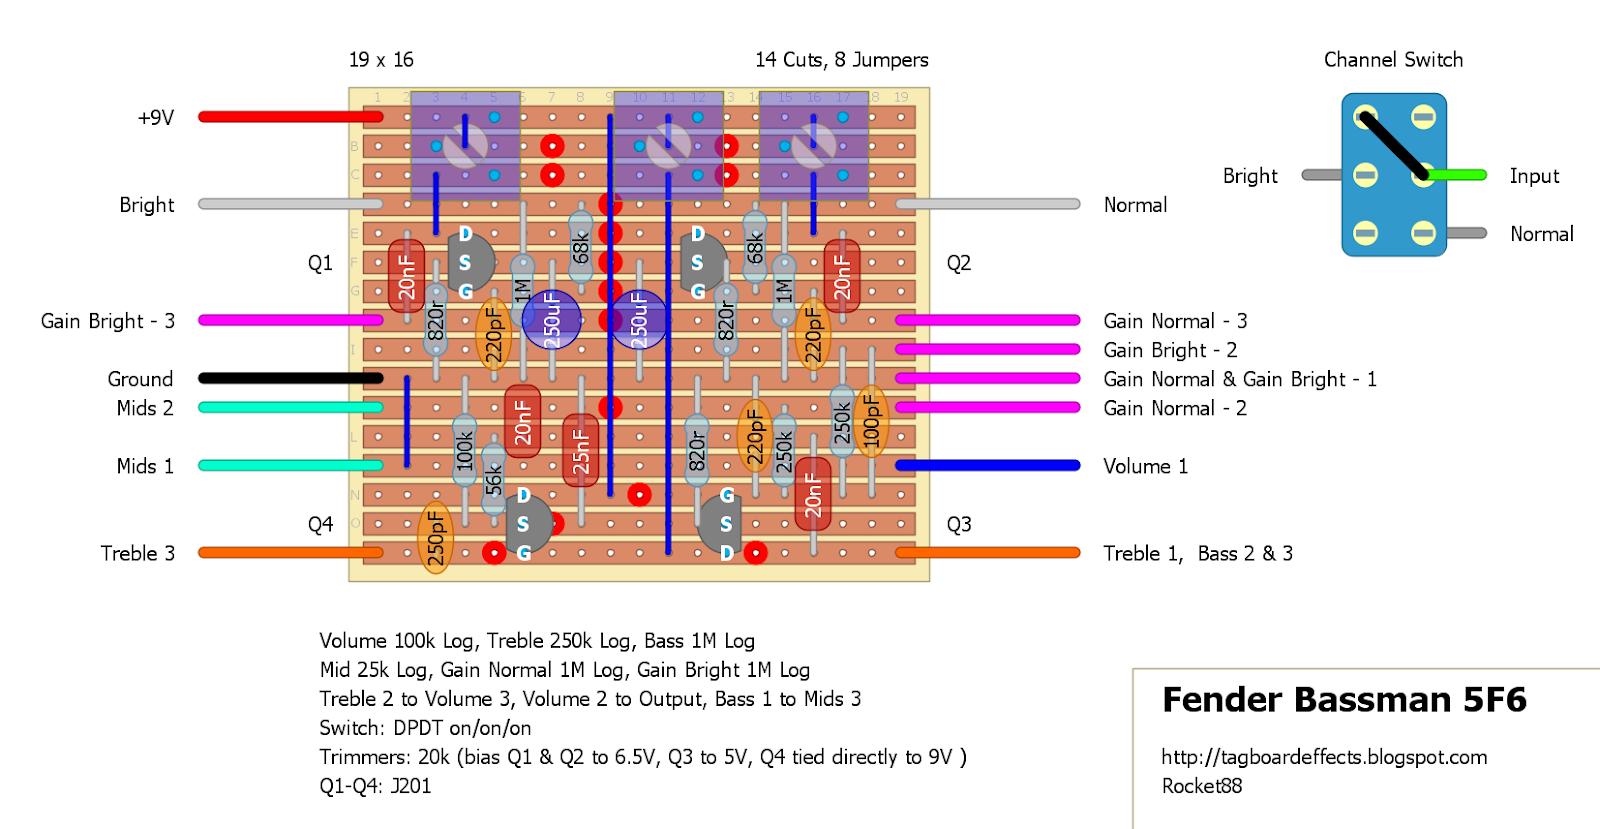 Guitar FX Layouts: Fender Bassman 5F6 Preamp